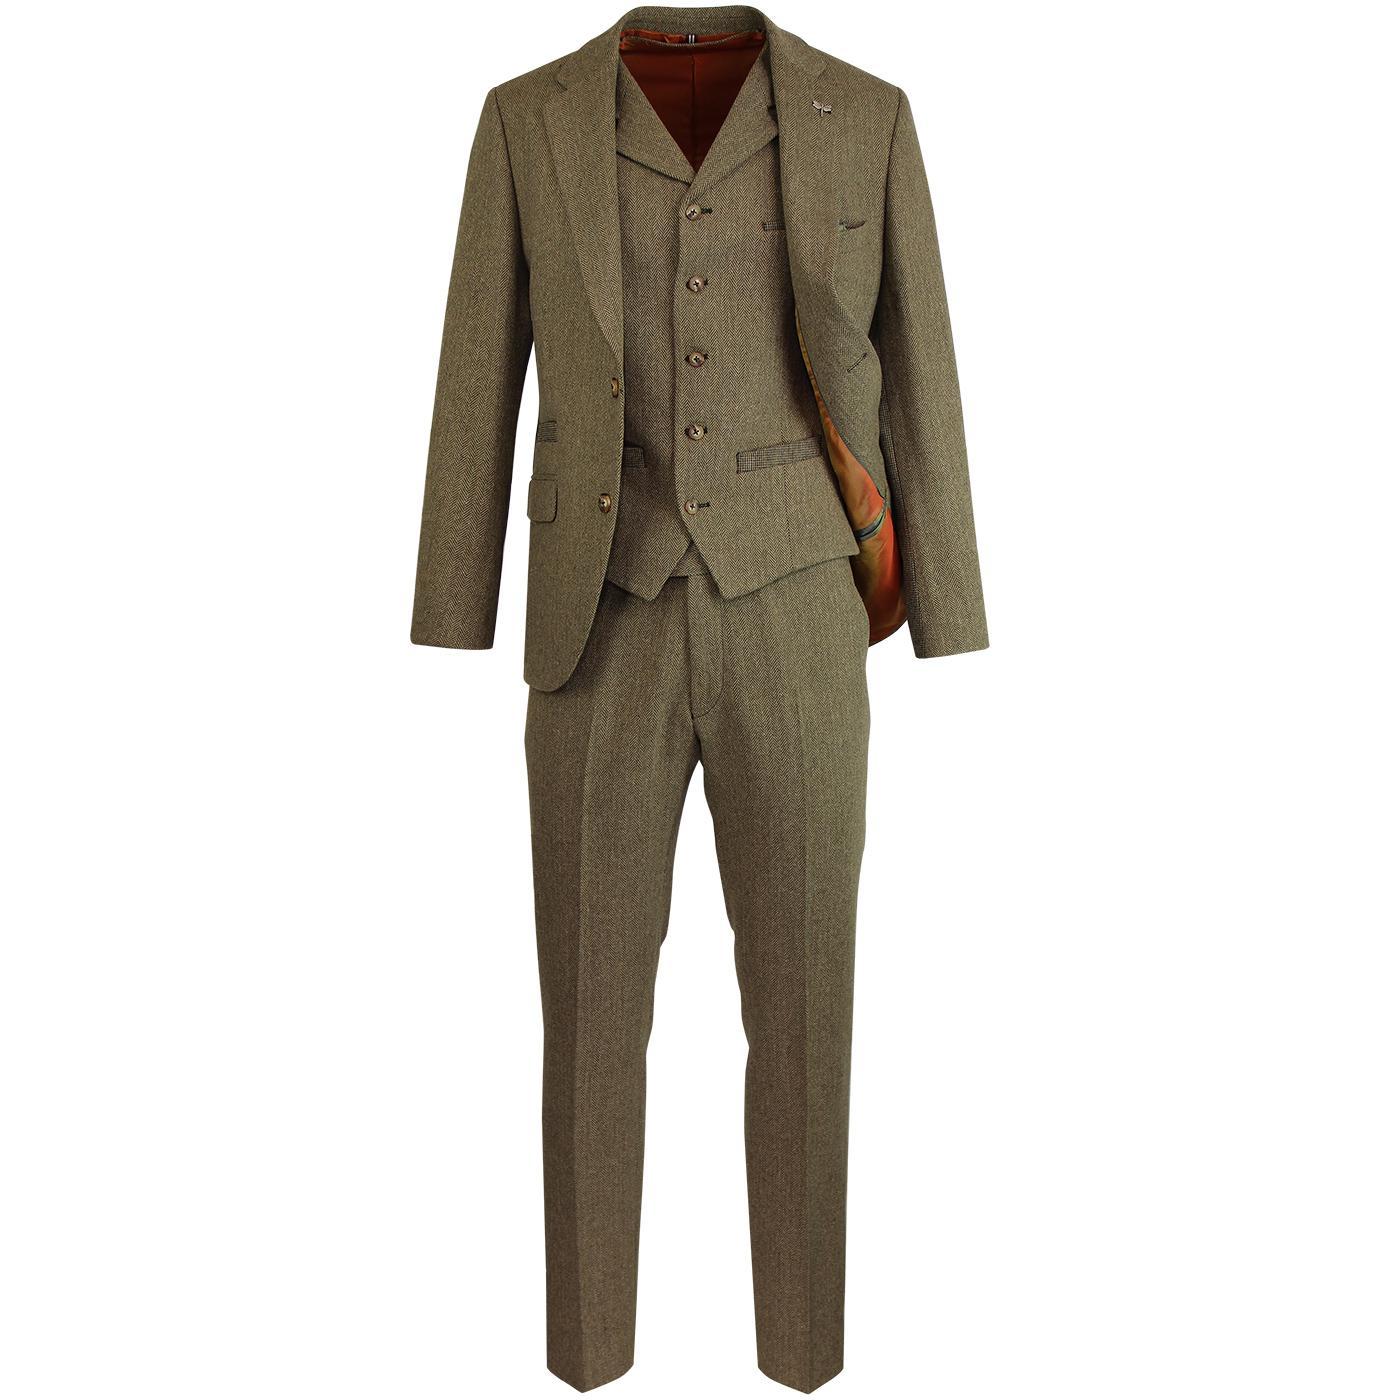 Towergate GIBSON LONDON Mod Herringbone Retro Suit